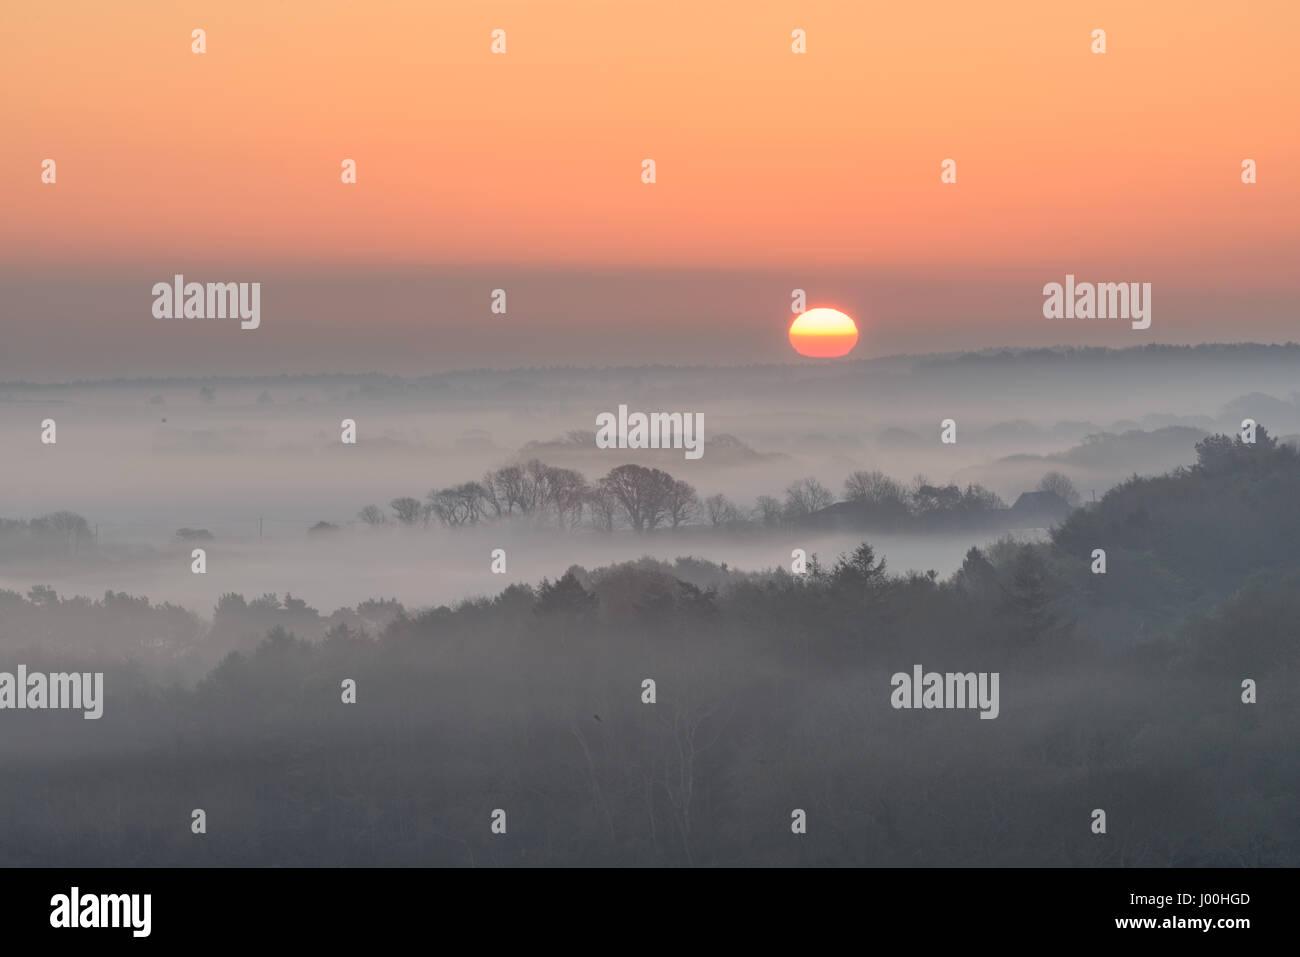 Corfe Castle, Dorset, UK. 8th April 2017. Glorious misty crisp sunrise over the Isle of Purbeck looking towards Stock Photo